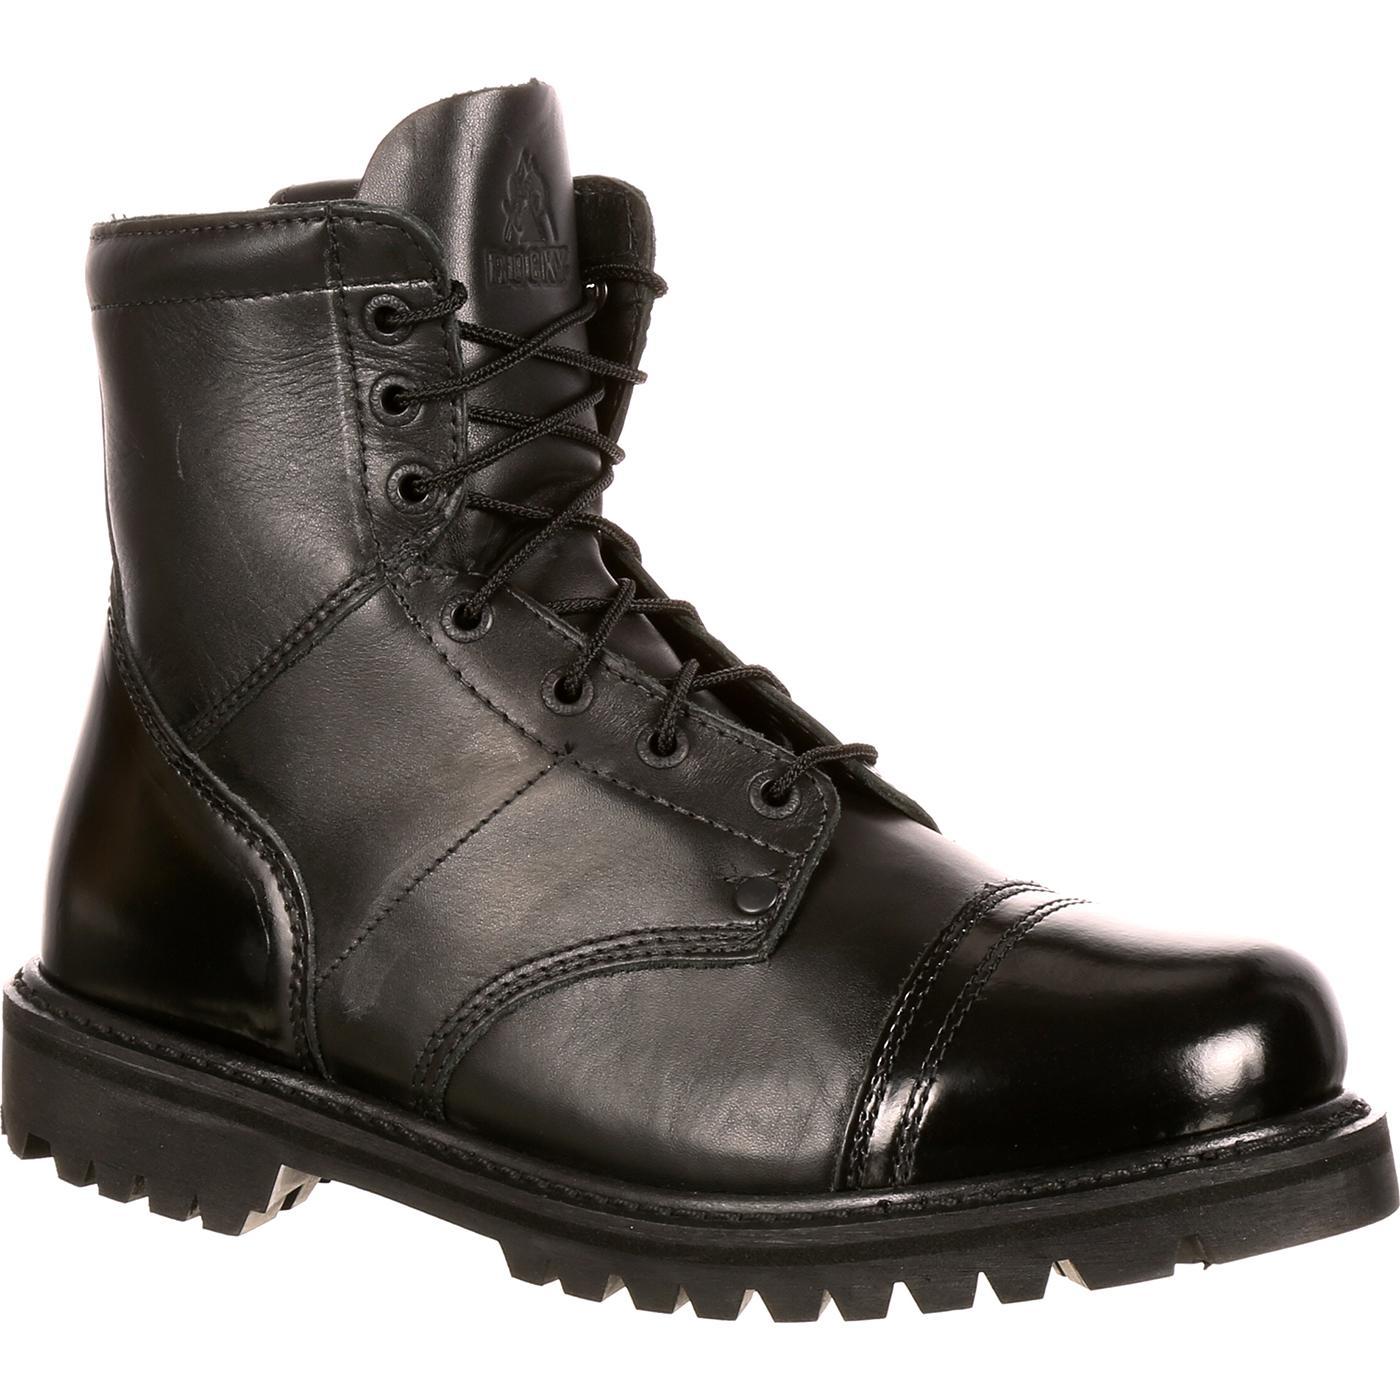 37ccbaca7d8 Rocky Duty Boots: Men's Black Side Zipper 7-Inch Jump Boot